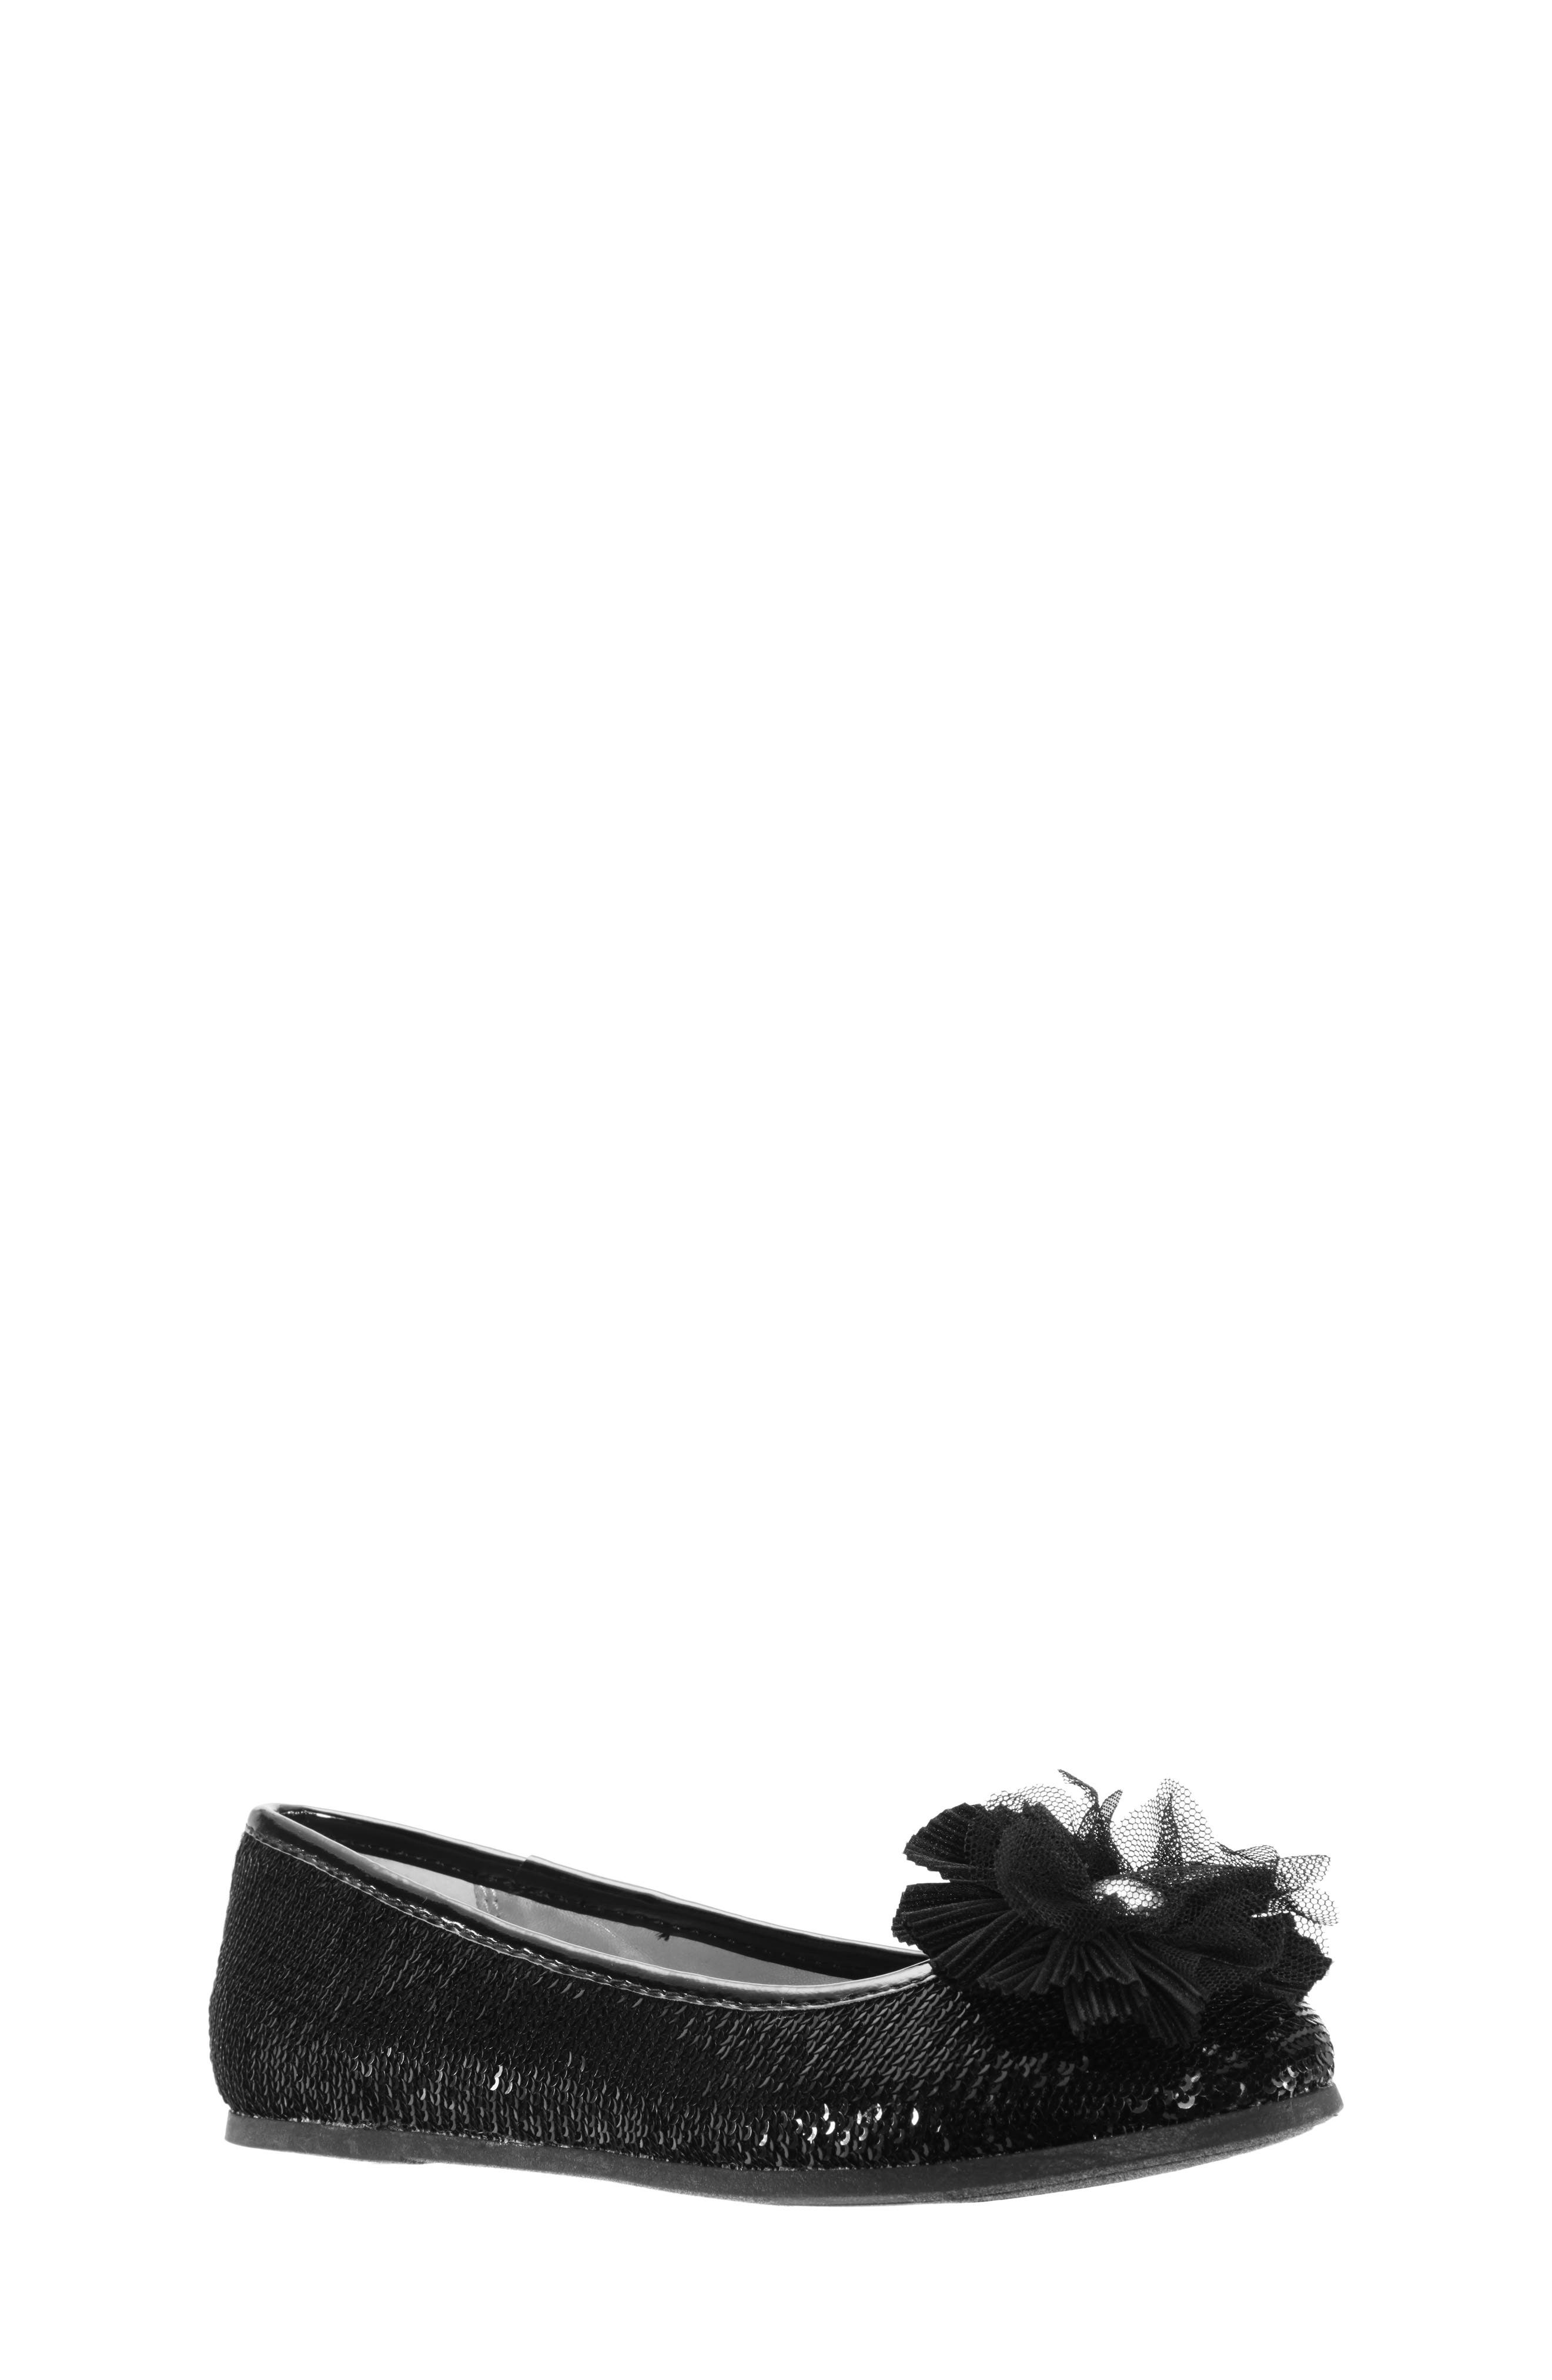 Girls Nina Sequin Ballet Flat Size 6 M  Black